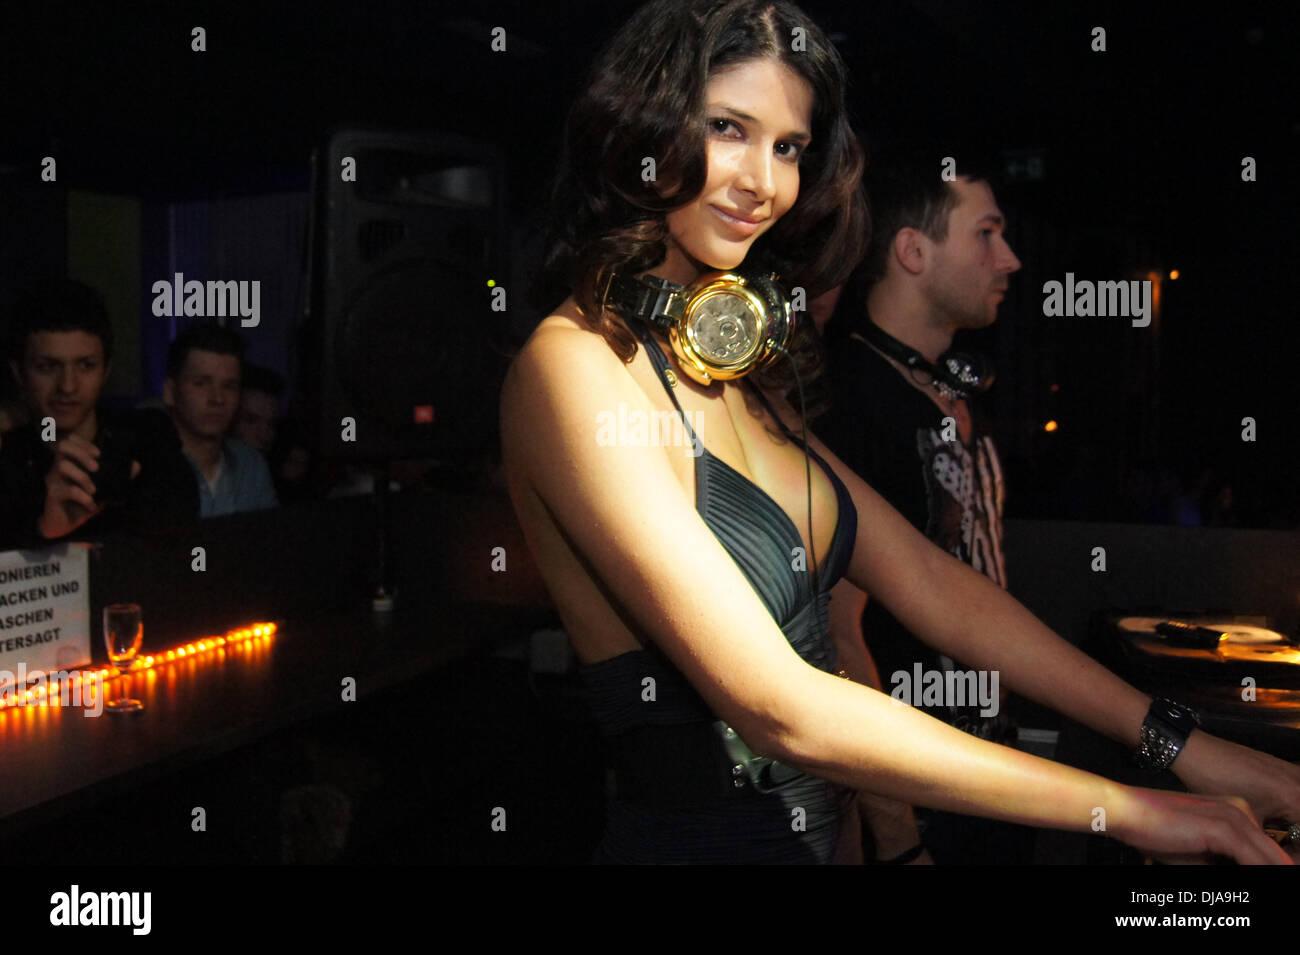 Micaela Schaefer DJing inside Club. Berlin, Germany. 29.03.2012 - Stock Image